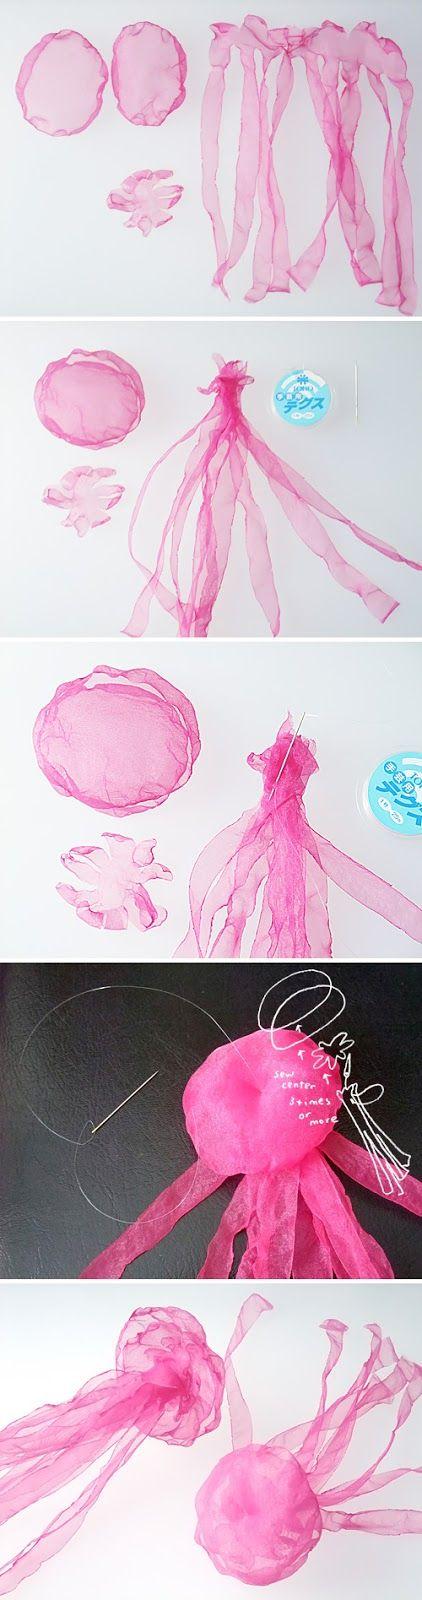 lazycraft: How to make... jellyfish!